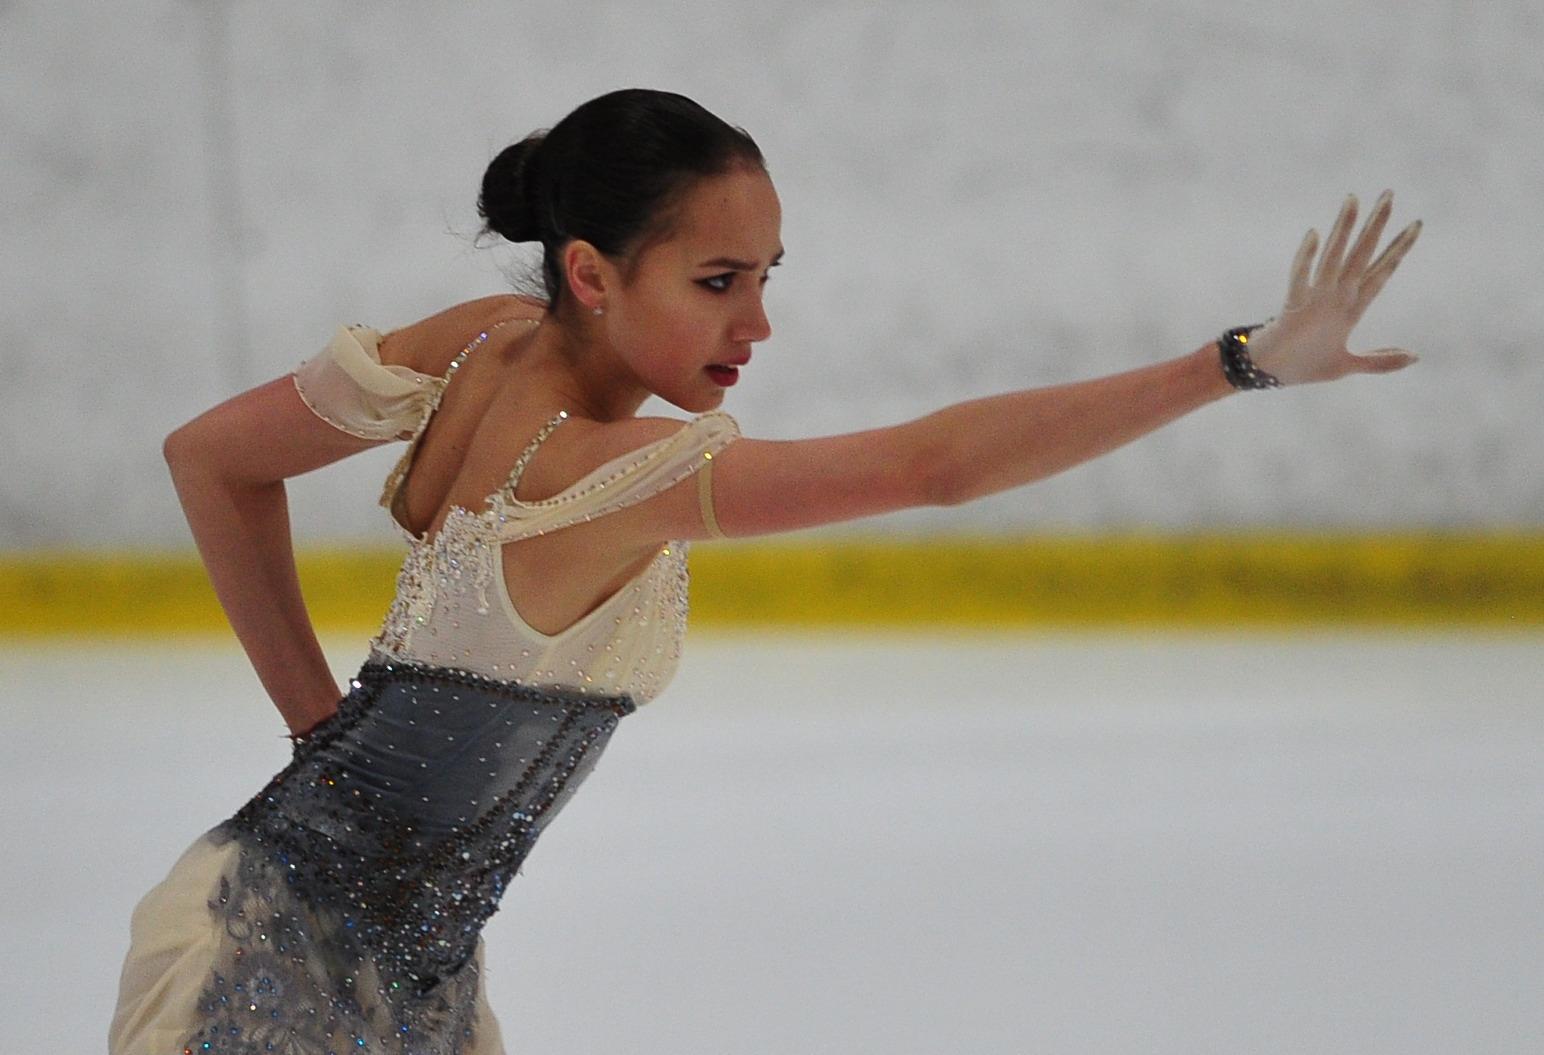 Алина Ильназовна Загитова-2 | Олимпийская чемпионка - Страница 6 A7K09_upd-A